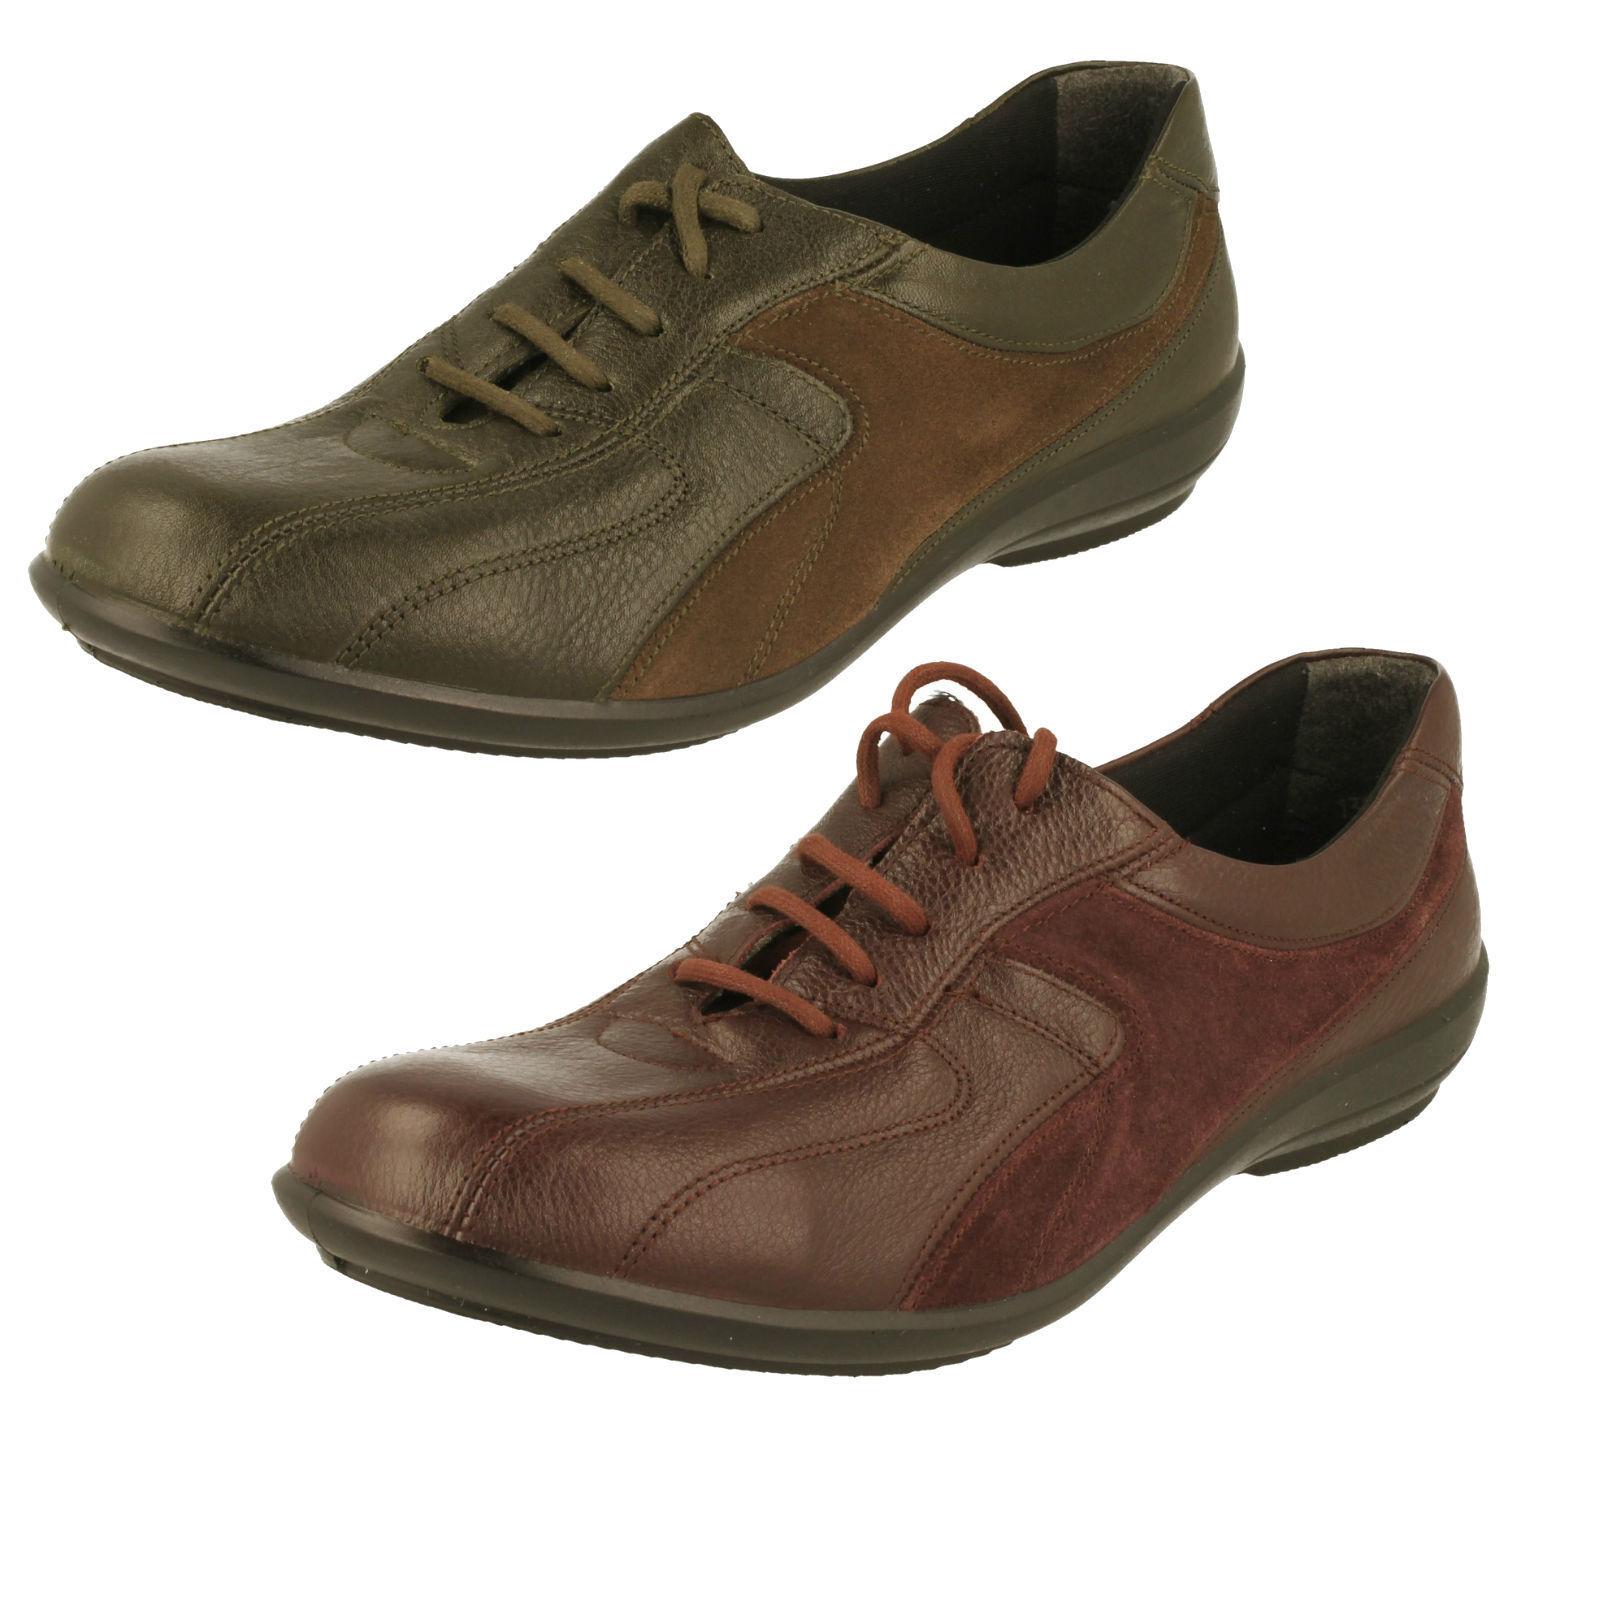 Ladies DB Lace Up shoes - Emma